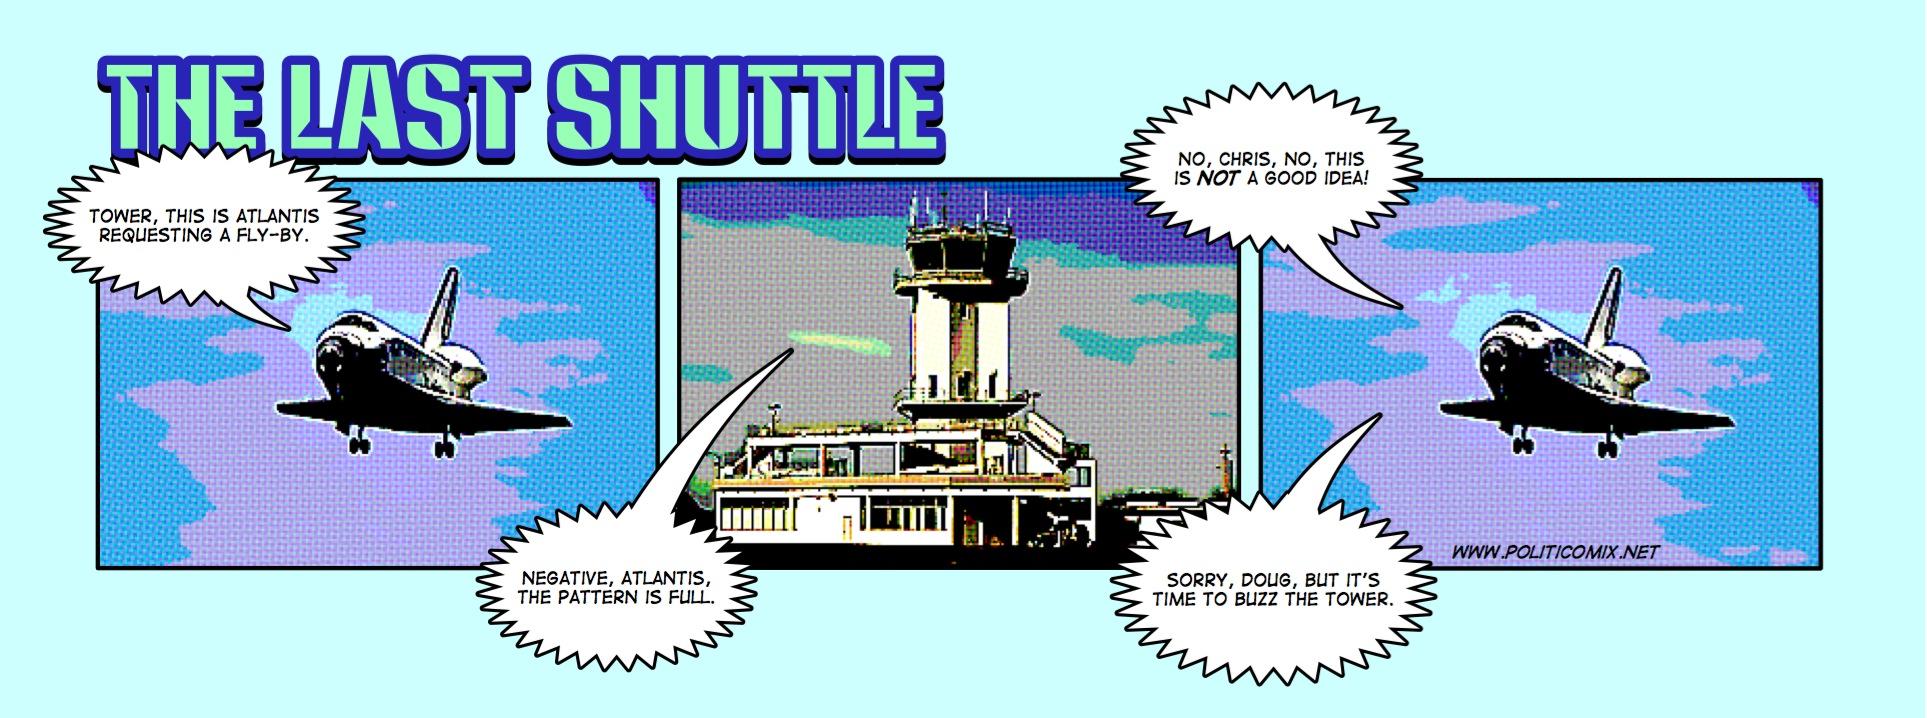 space shuttle comic - photo #11